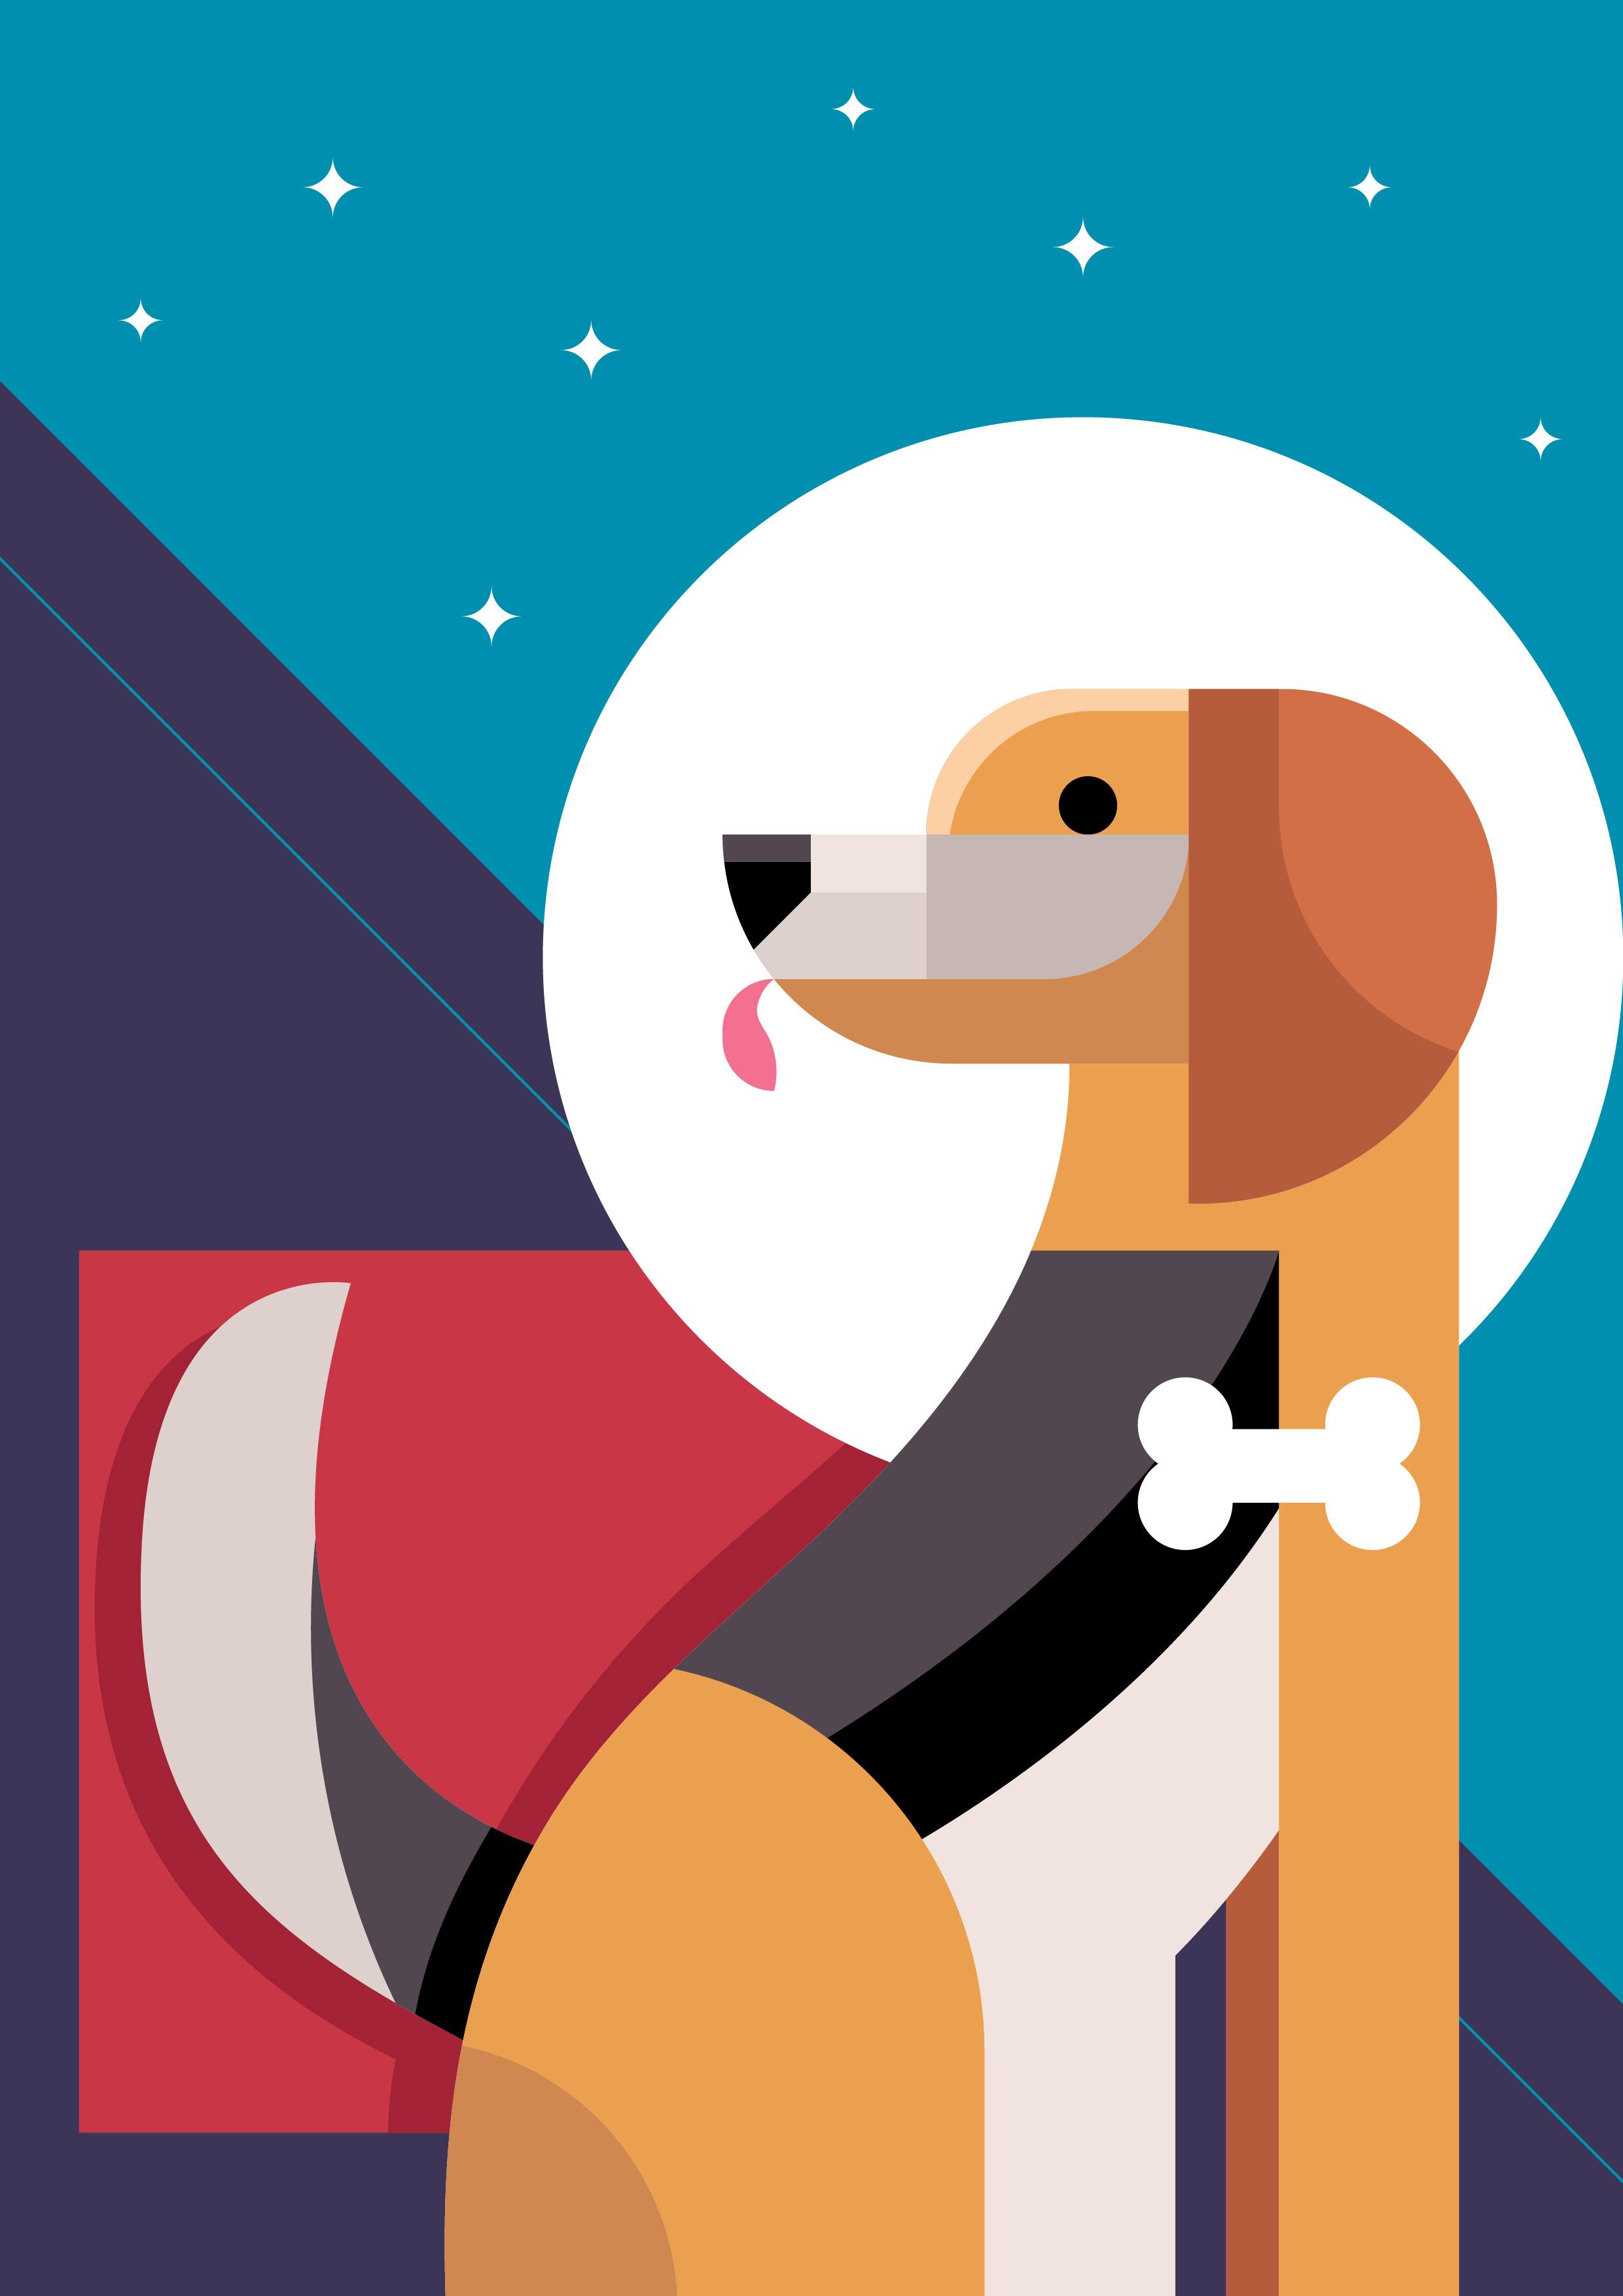 cartoon dog images free download